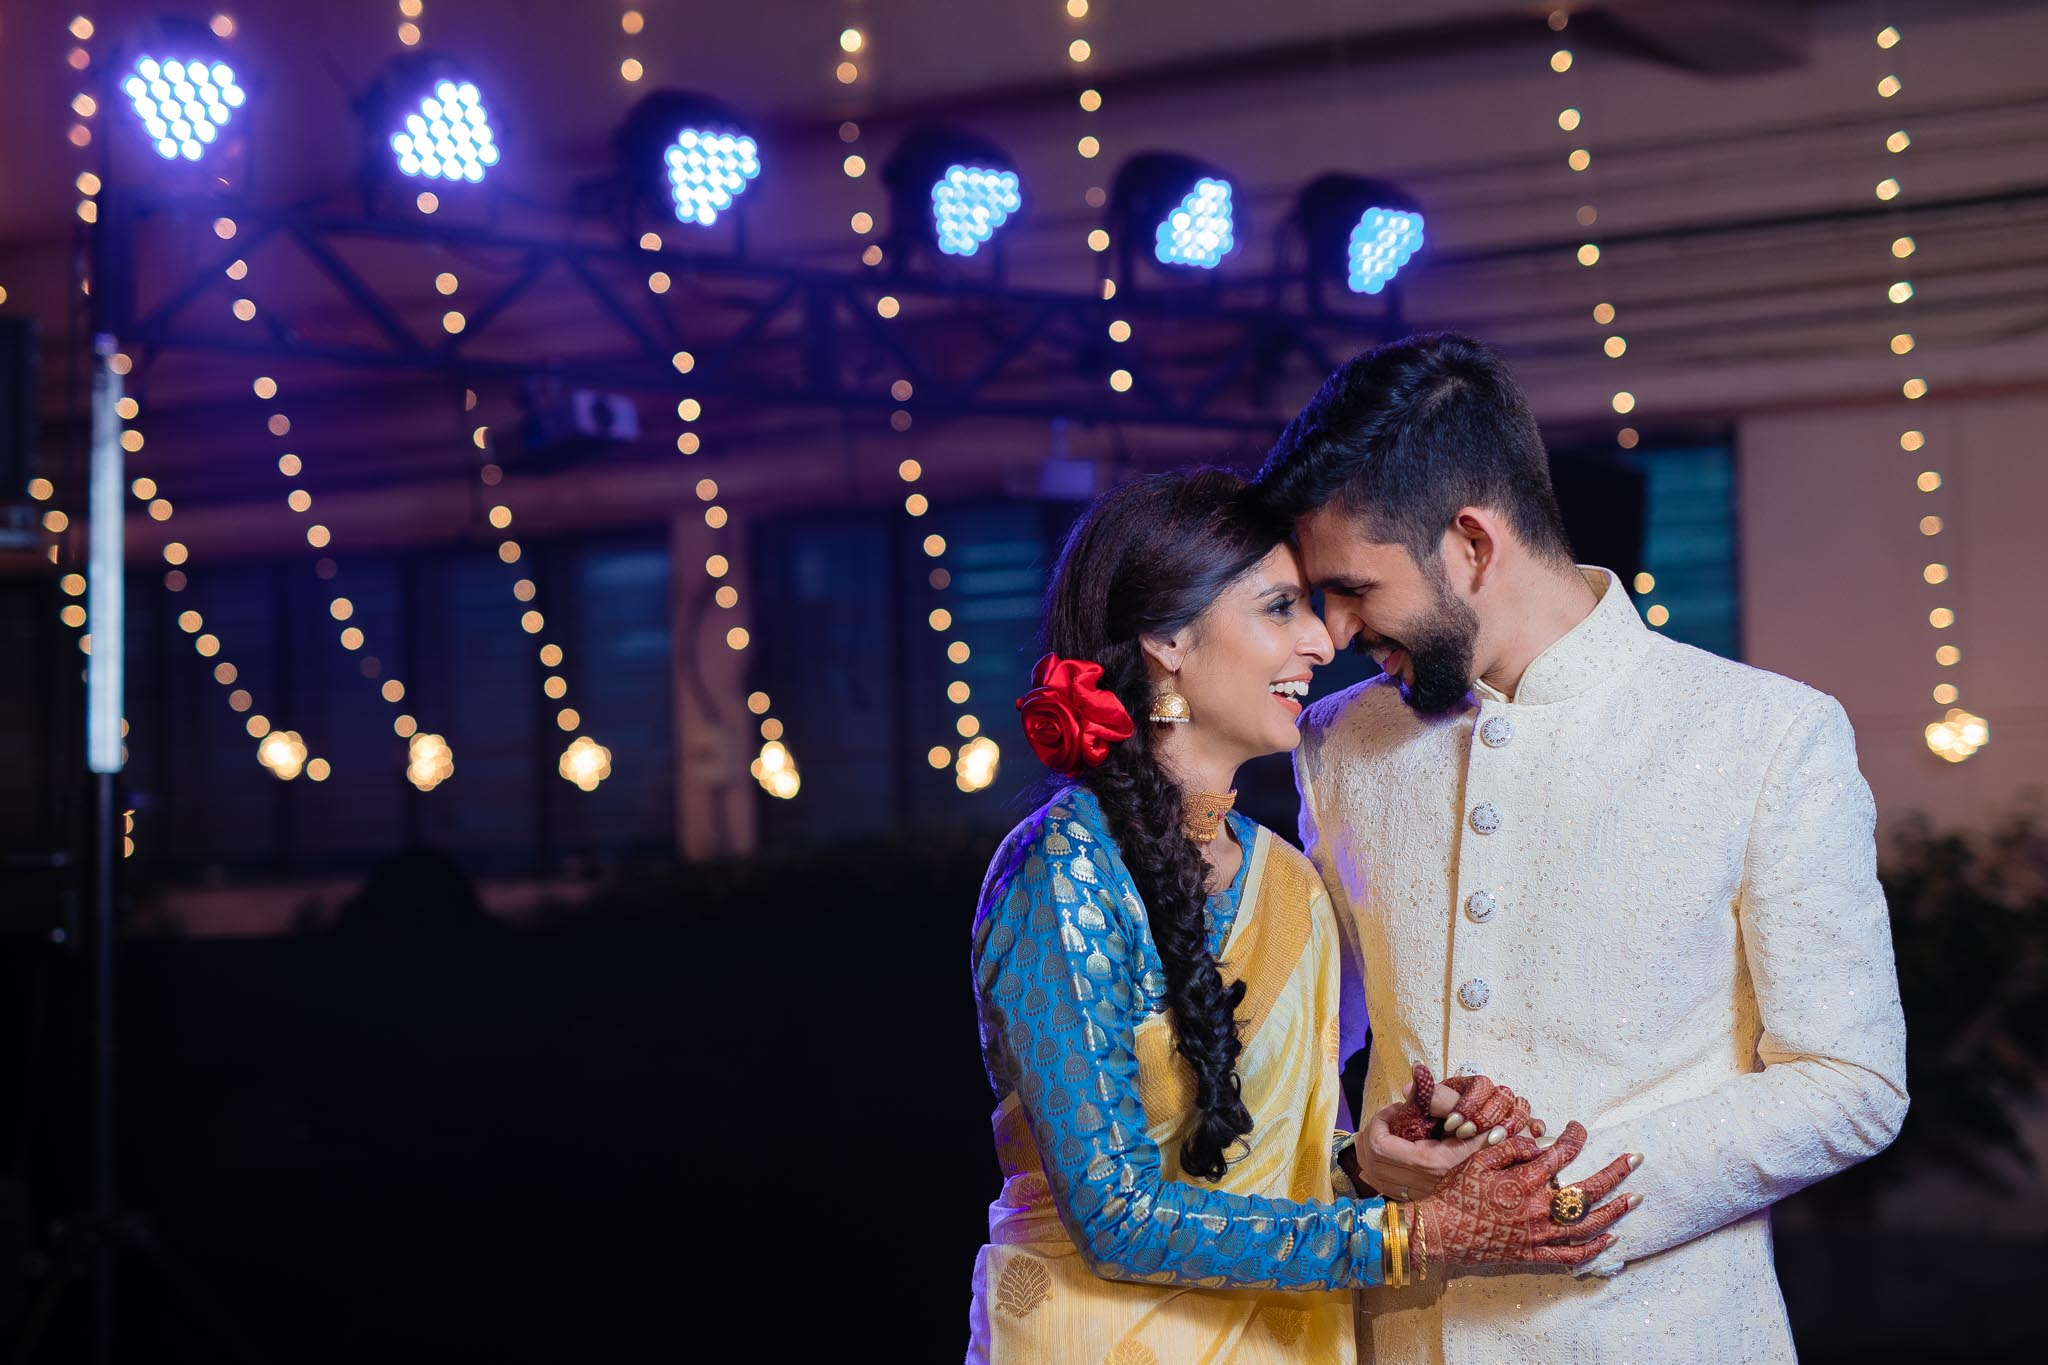 Best-of-2018-wedding-photography-focuz-studios-64